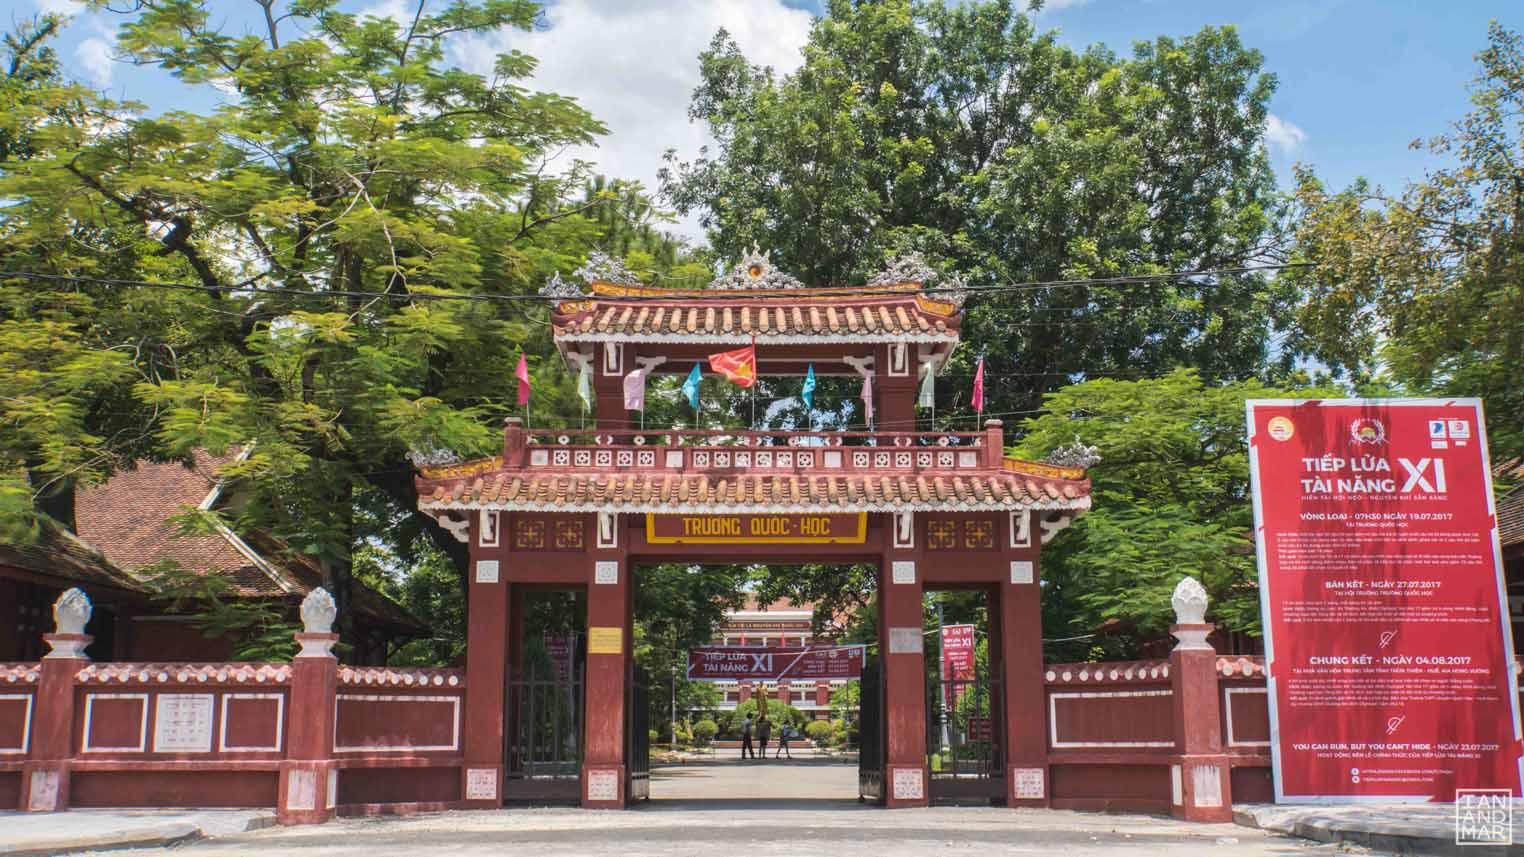 school gate in Vietnam